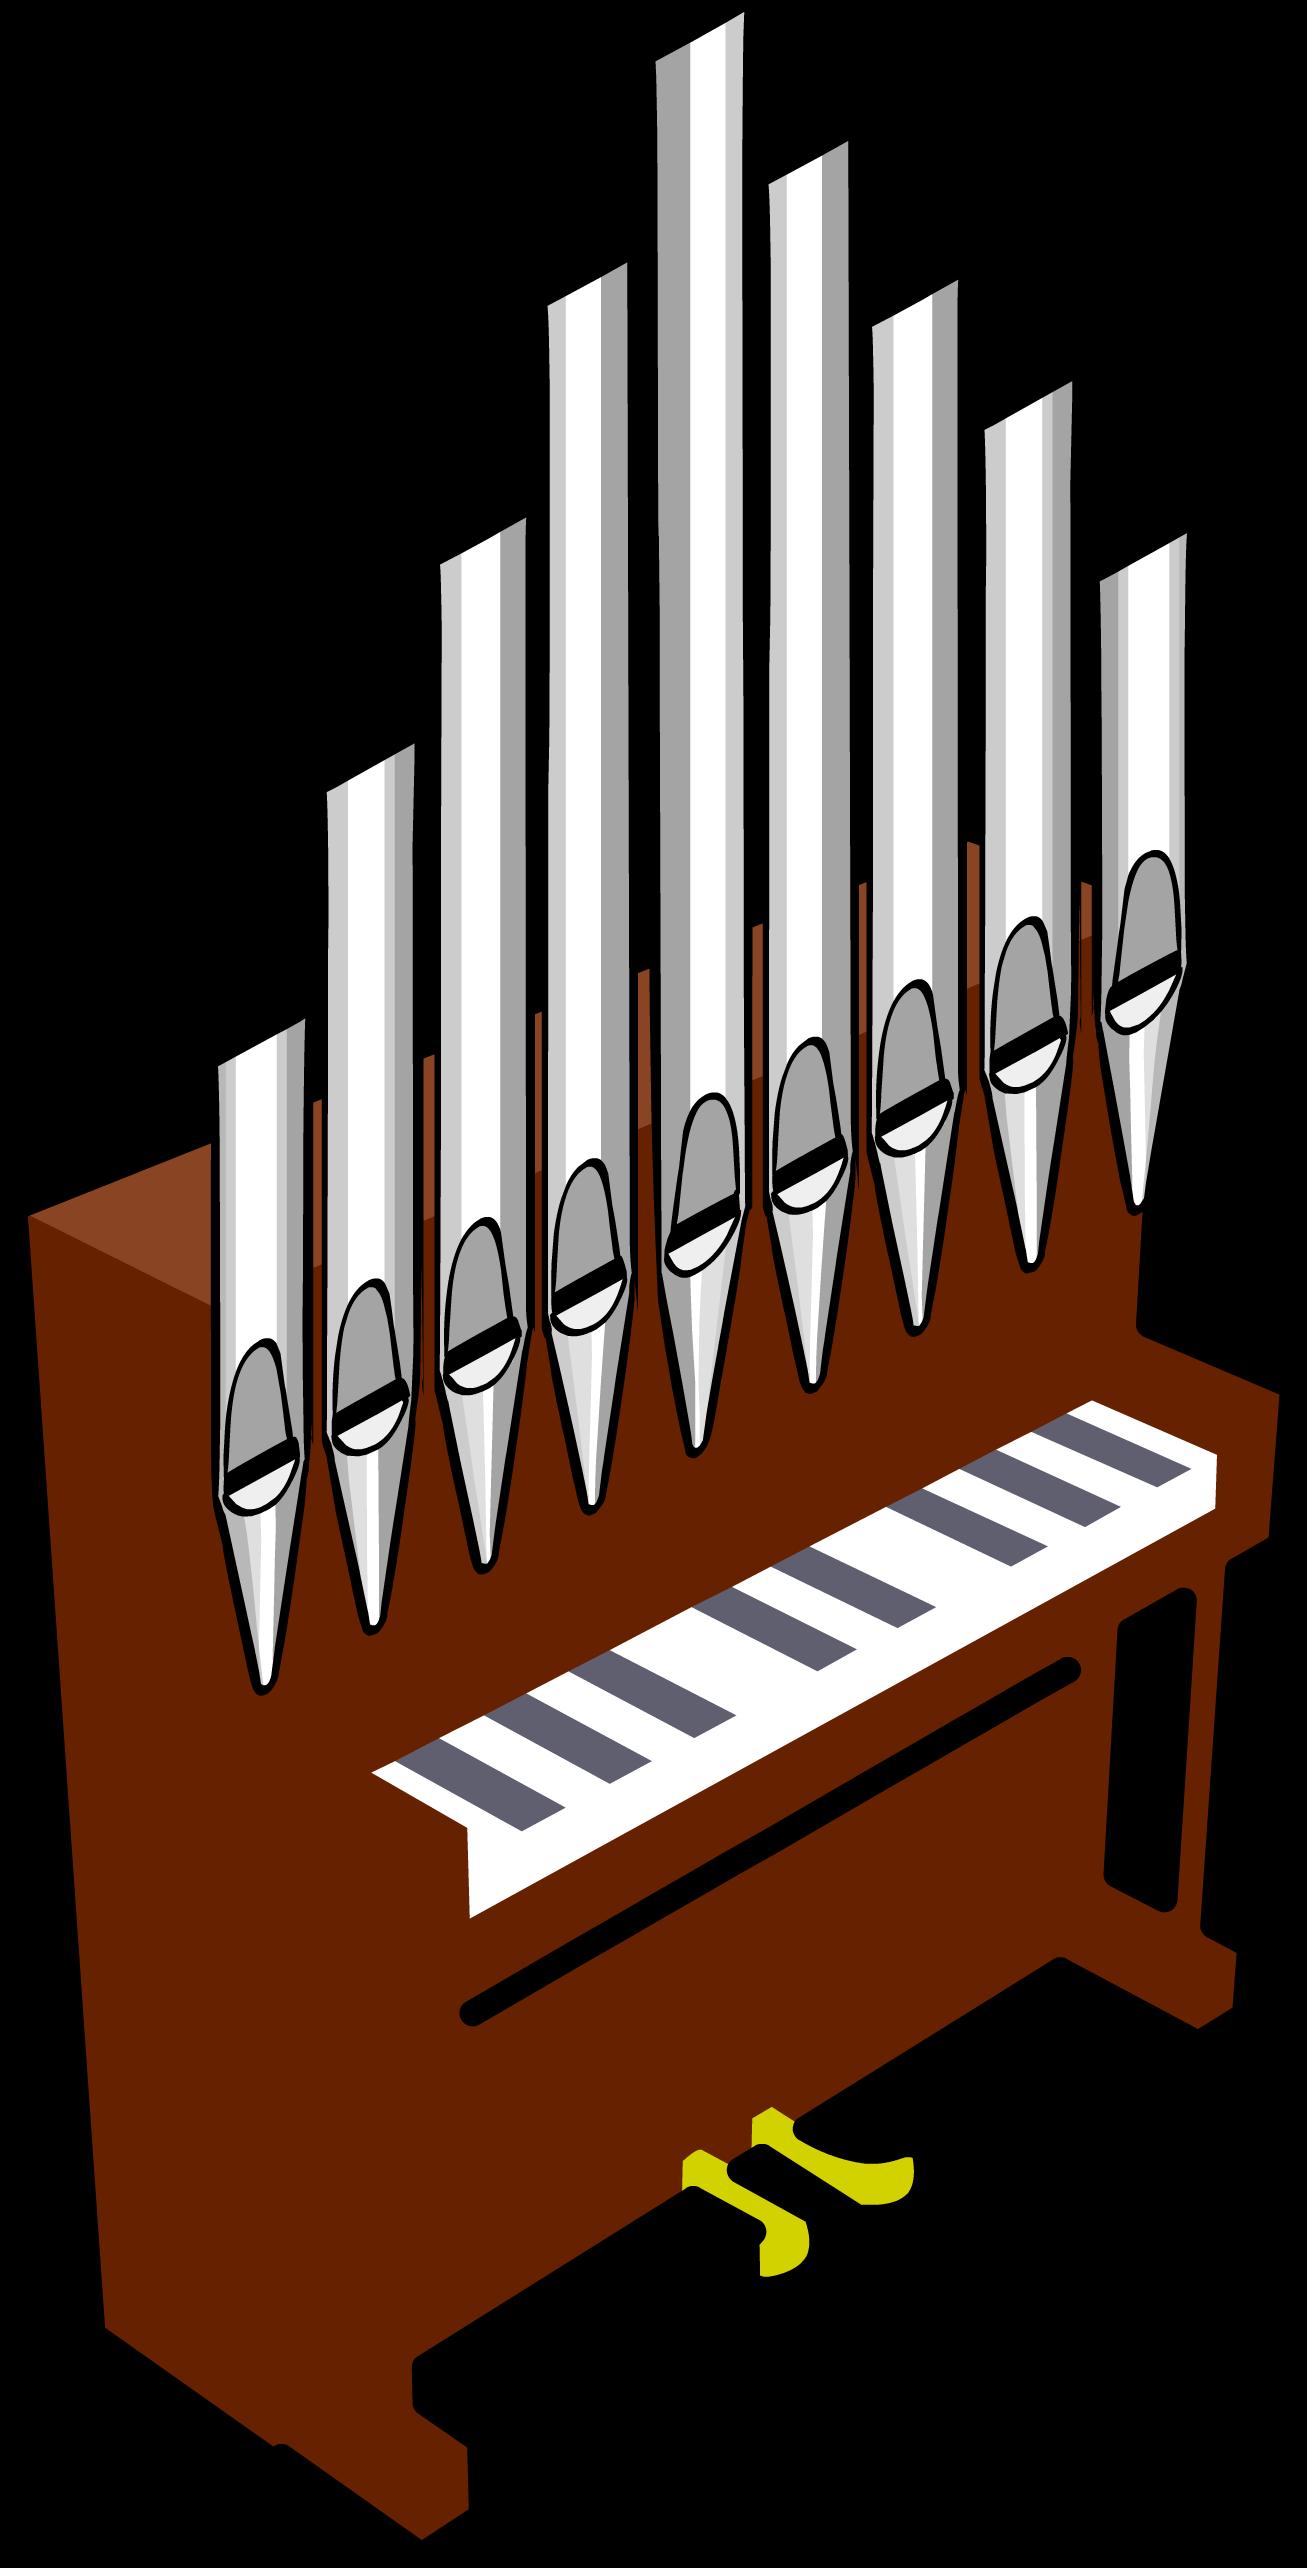 image pipe organ sprite 008 png club penguin wiki fandom rh clubpenguin wikia com Church Organ Clip Art Church Organ Art